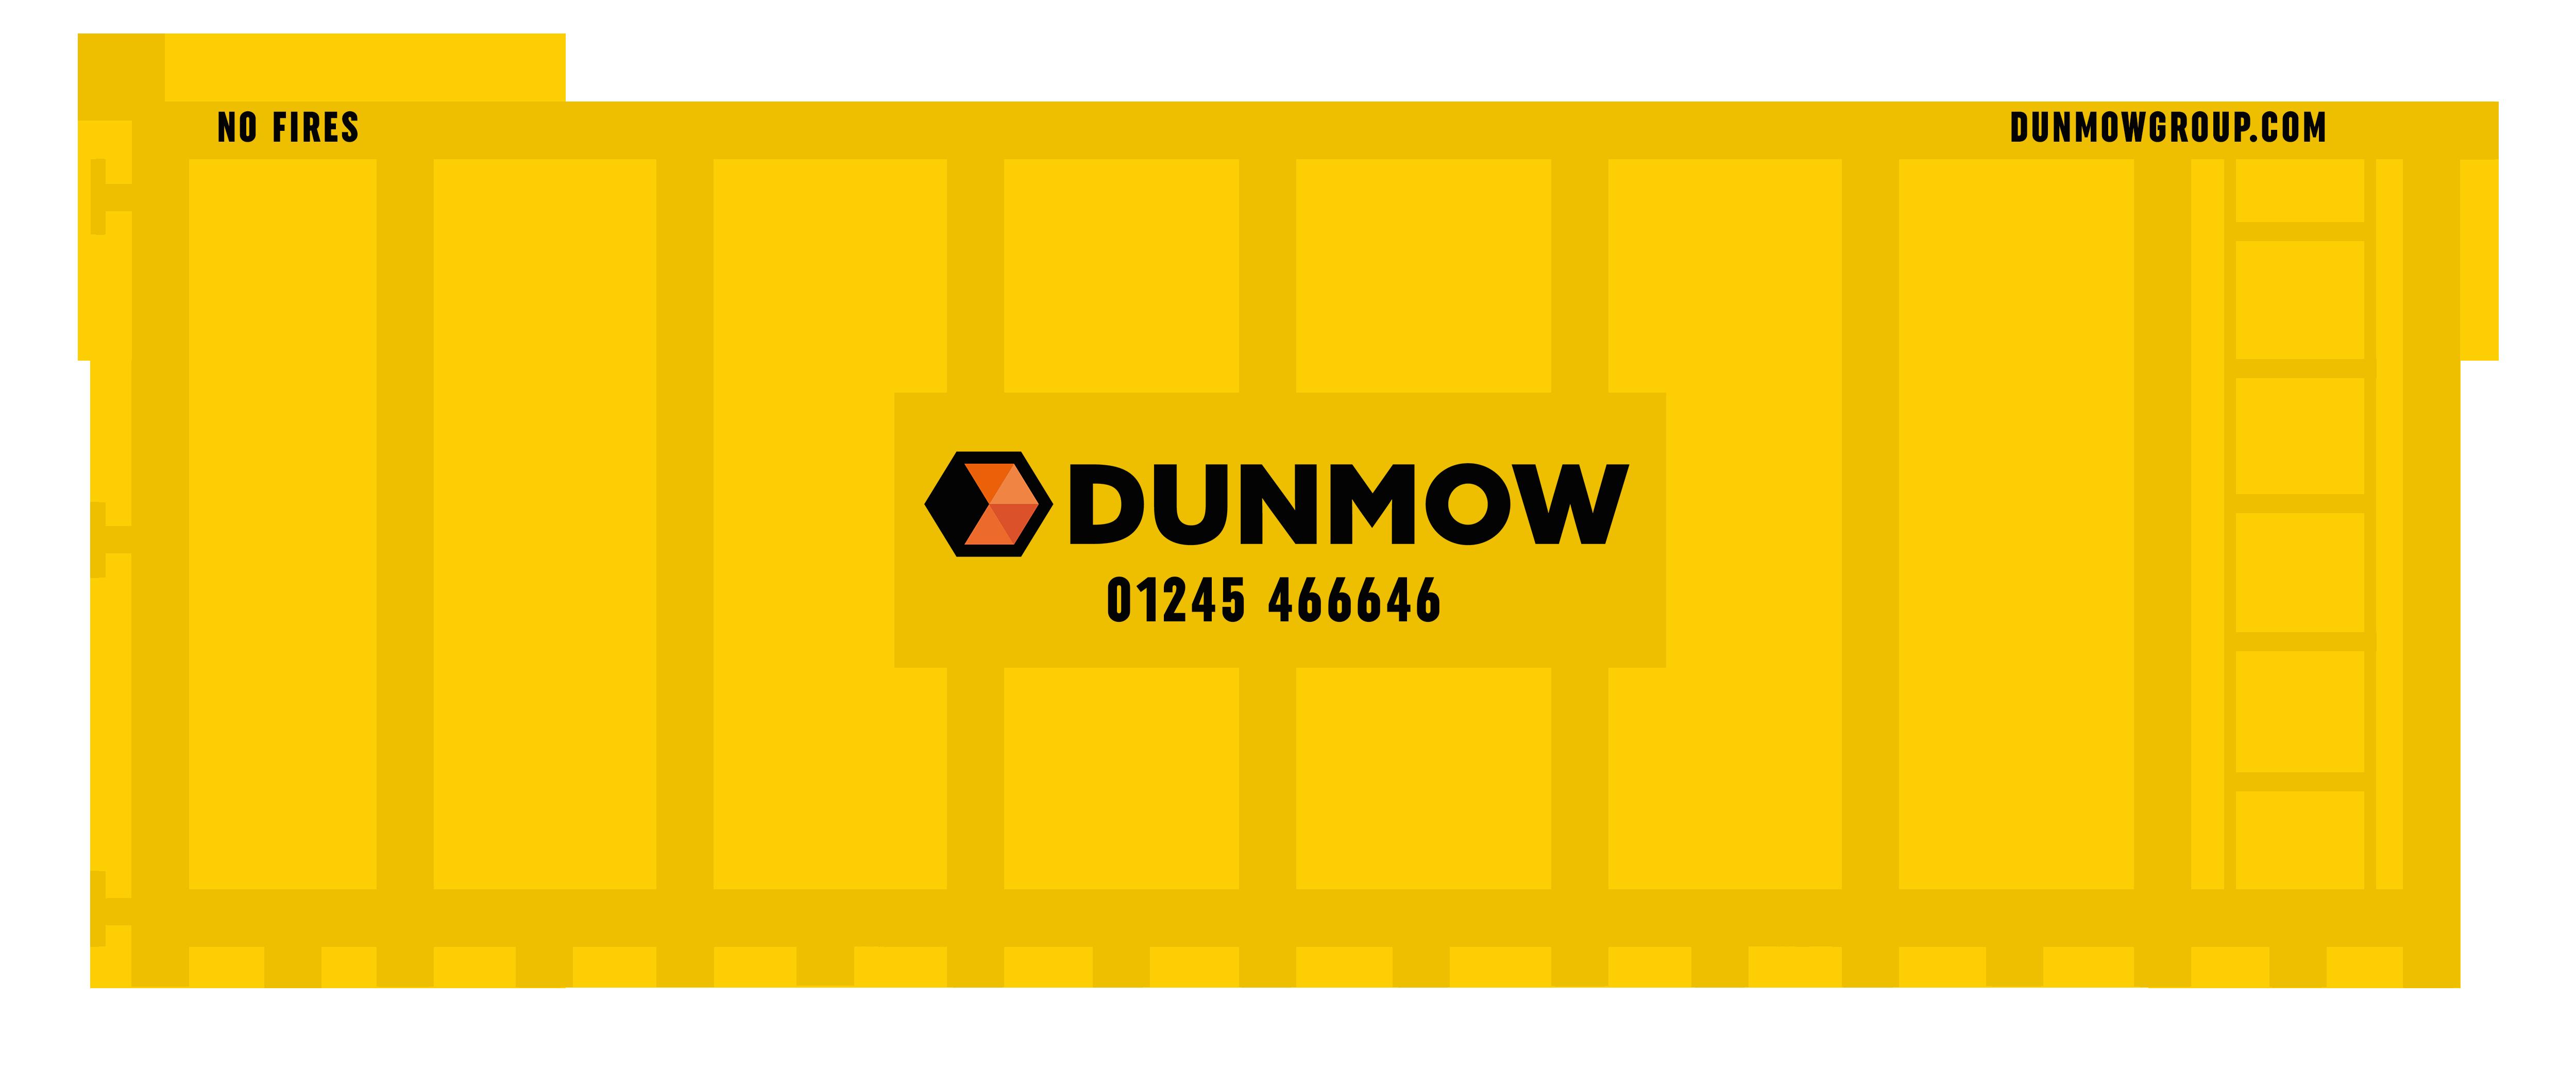 Dunmow-RORO-Illustration-20-Yard